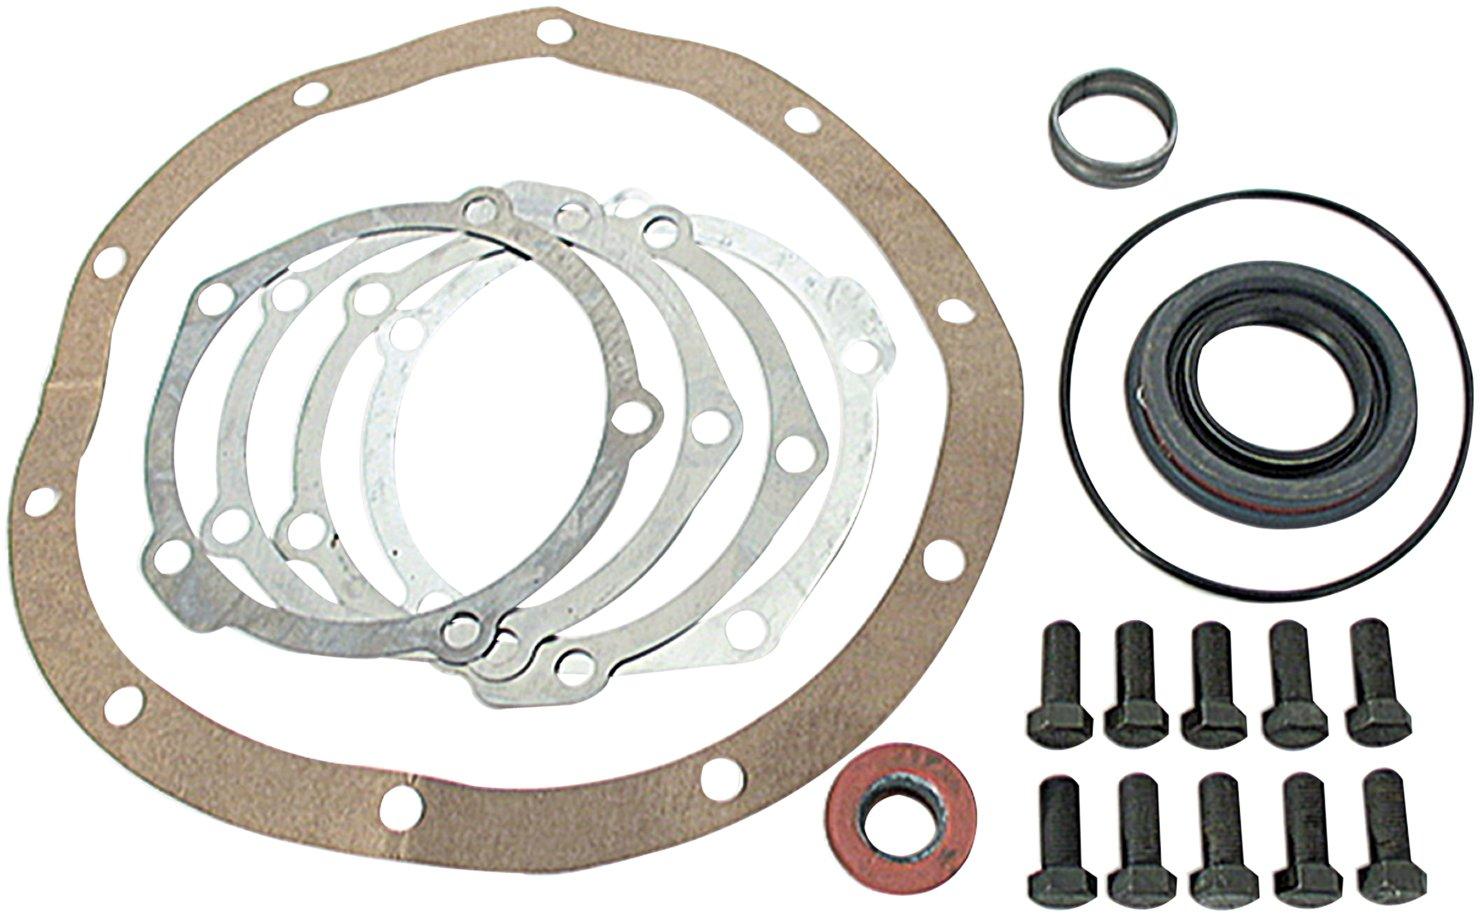 Allstar ALL68611 Ring and Pinion Shim Kit for Ford Allstar Performance